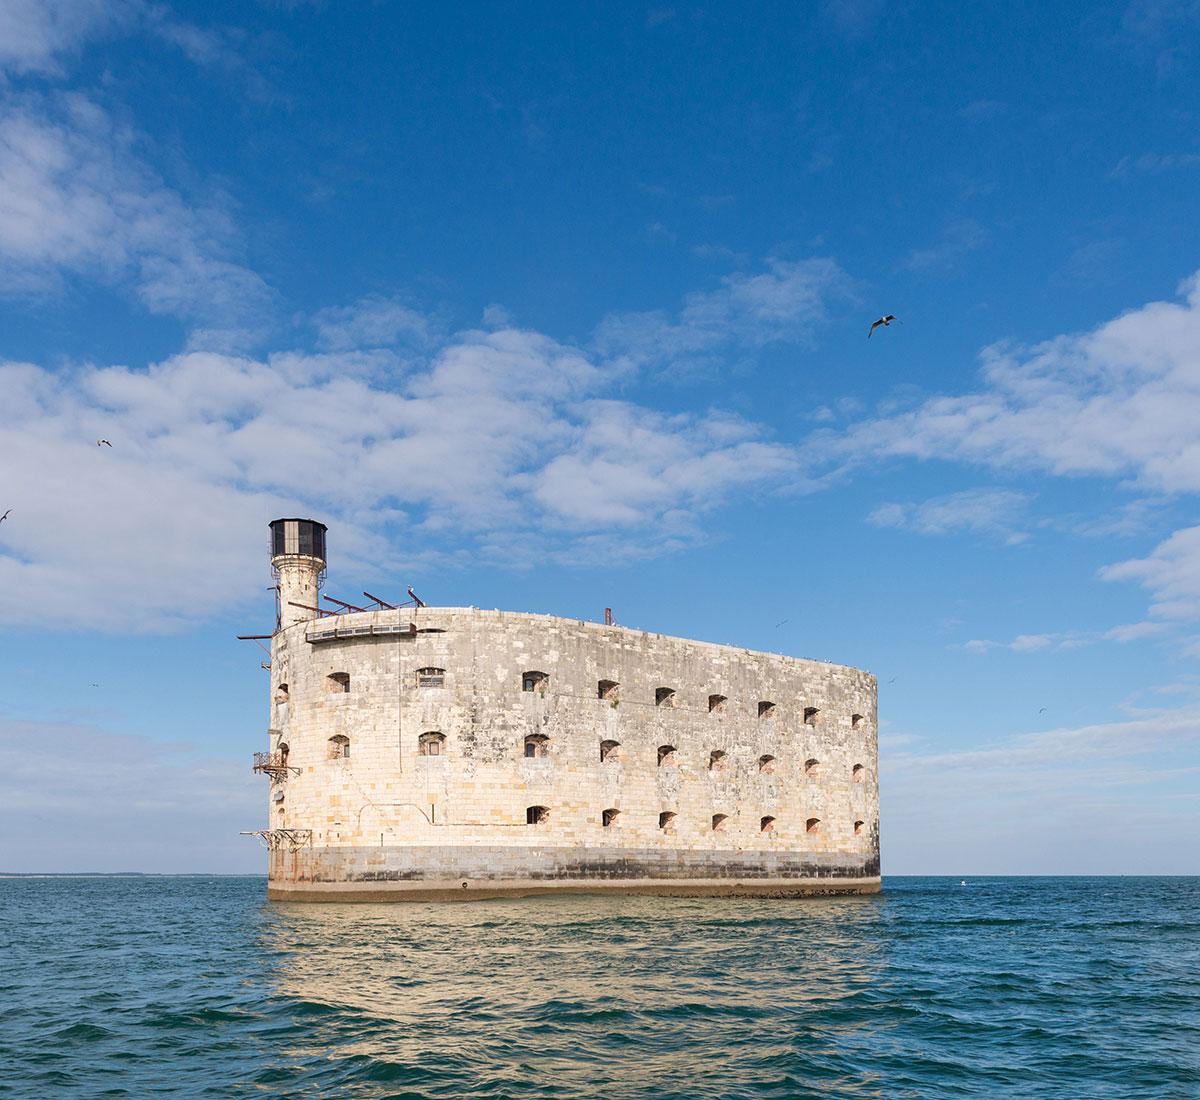 Catamaran Harmony à Fort Boyard